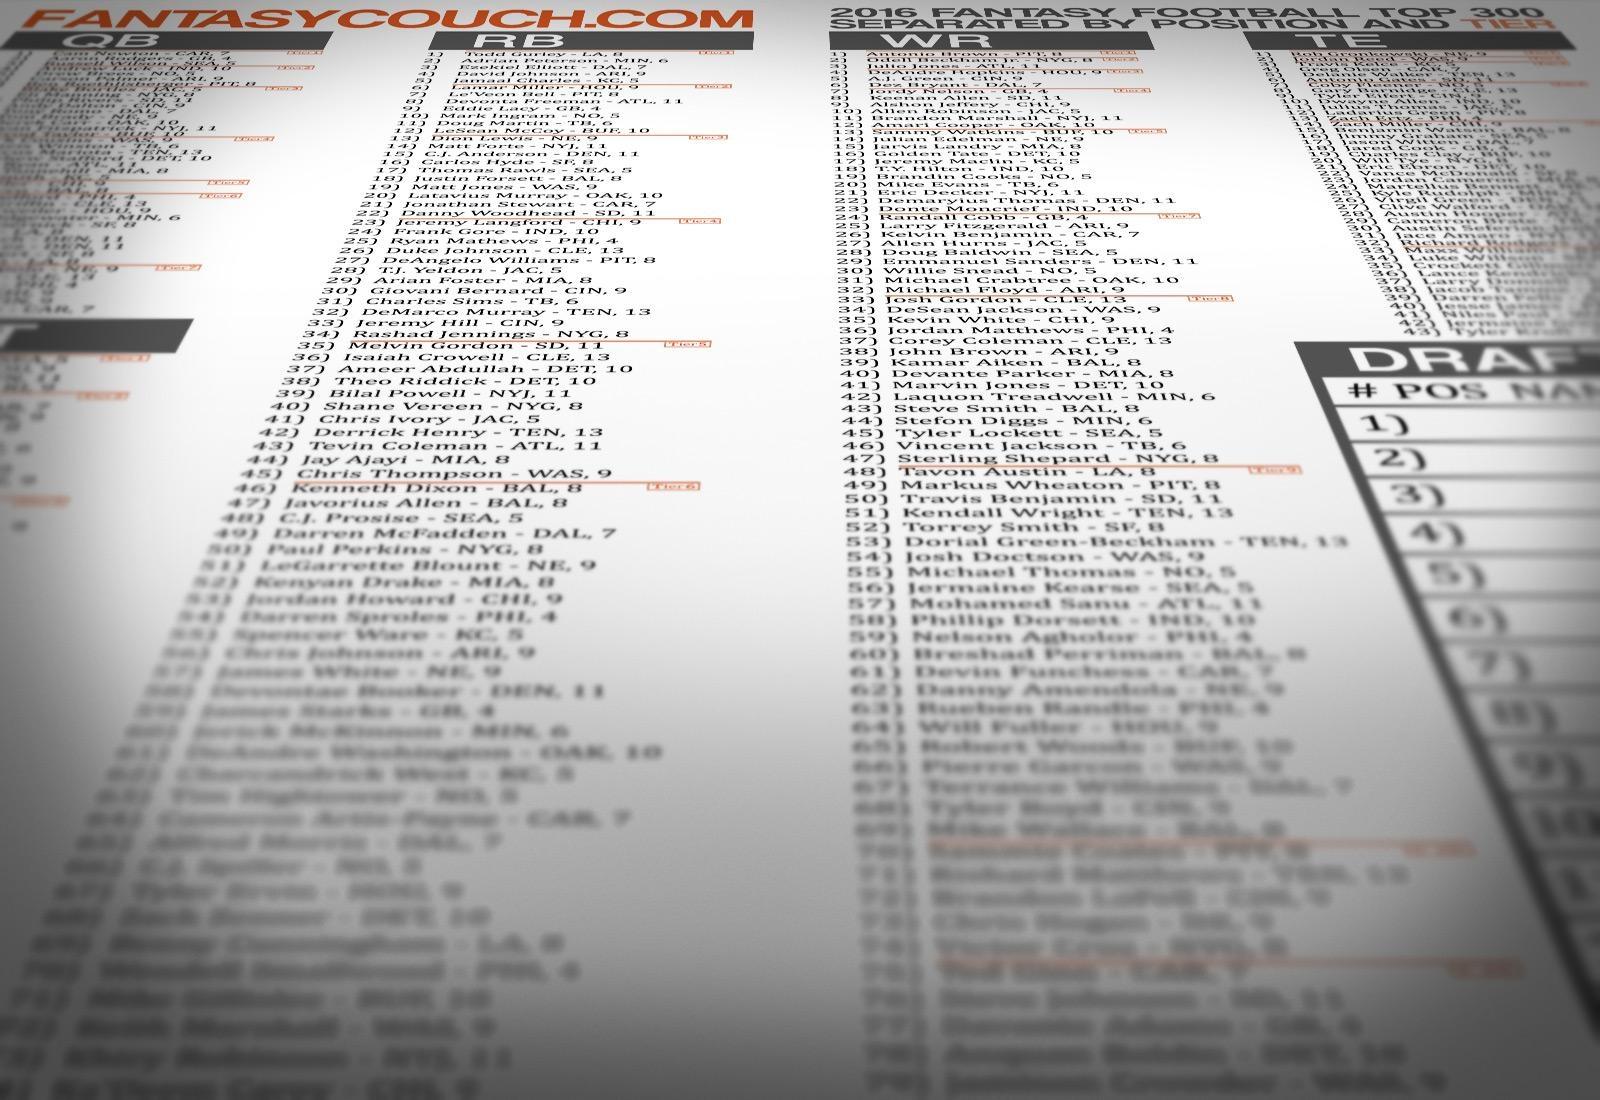 Top 300 List - Fantasy Football 2018 Cheat Sheet - Free Fantasy Football Printable Draft Sheets